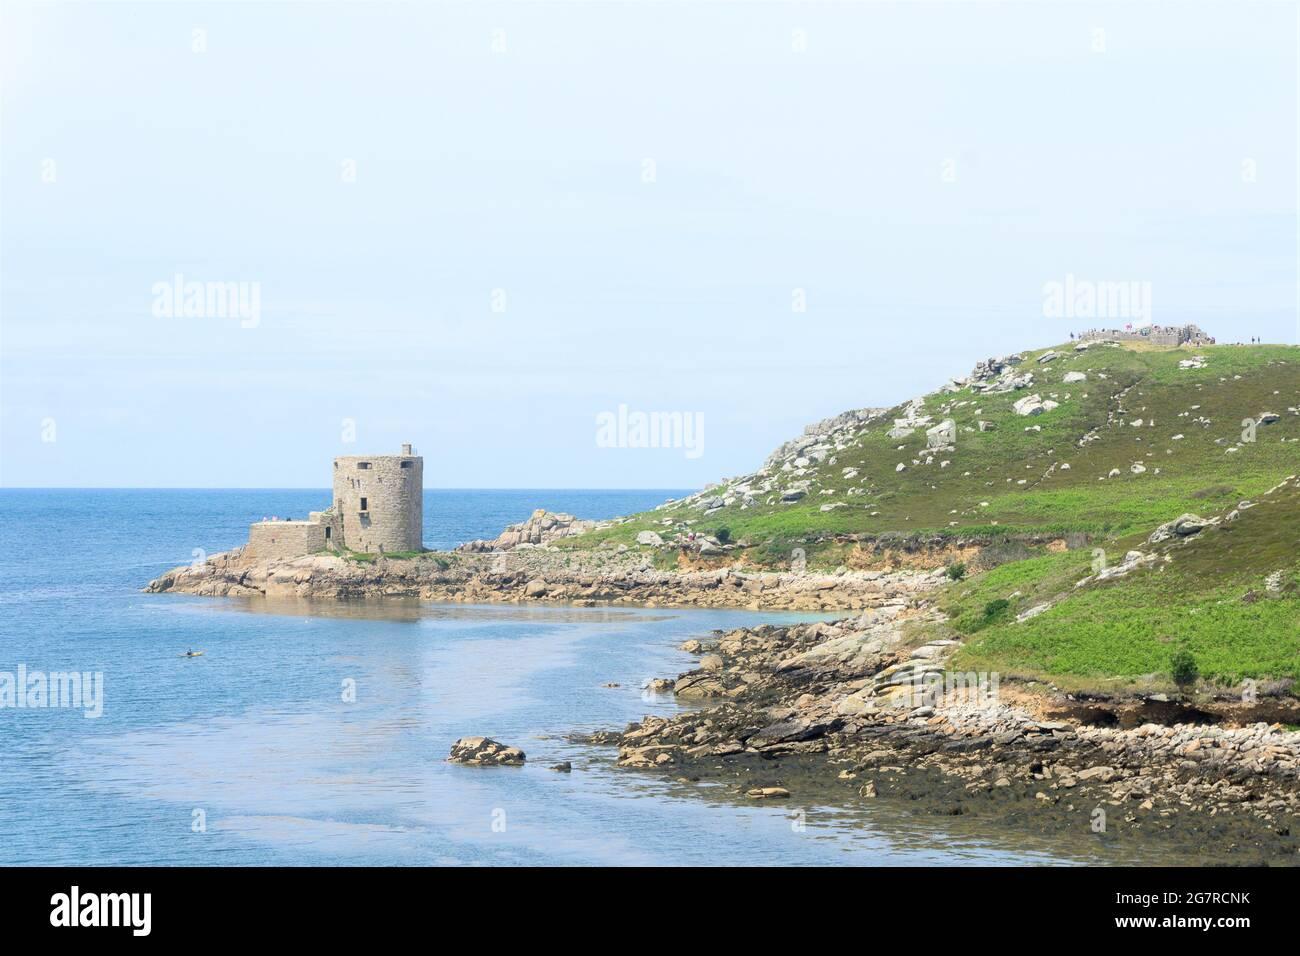 Cromwell's Castle sur Tresco, Îles Scilly, Cornwall, UK Banque D'Images